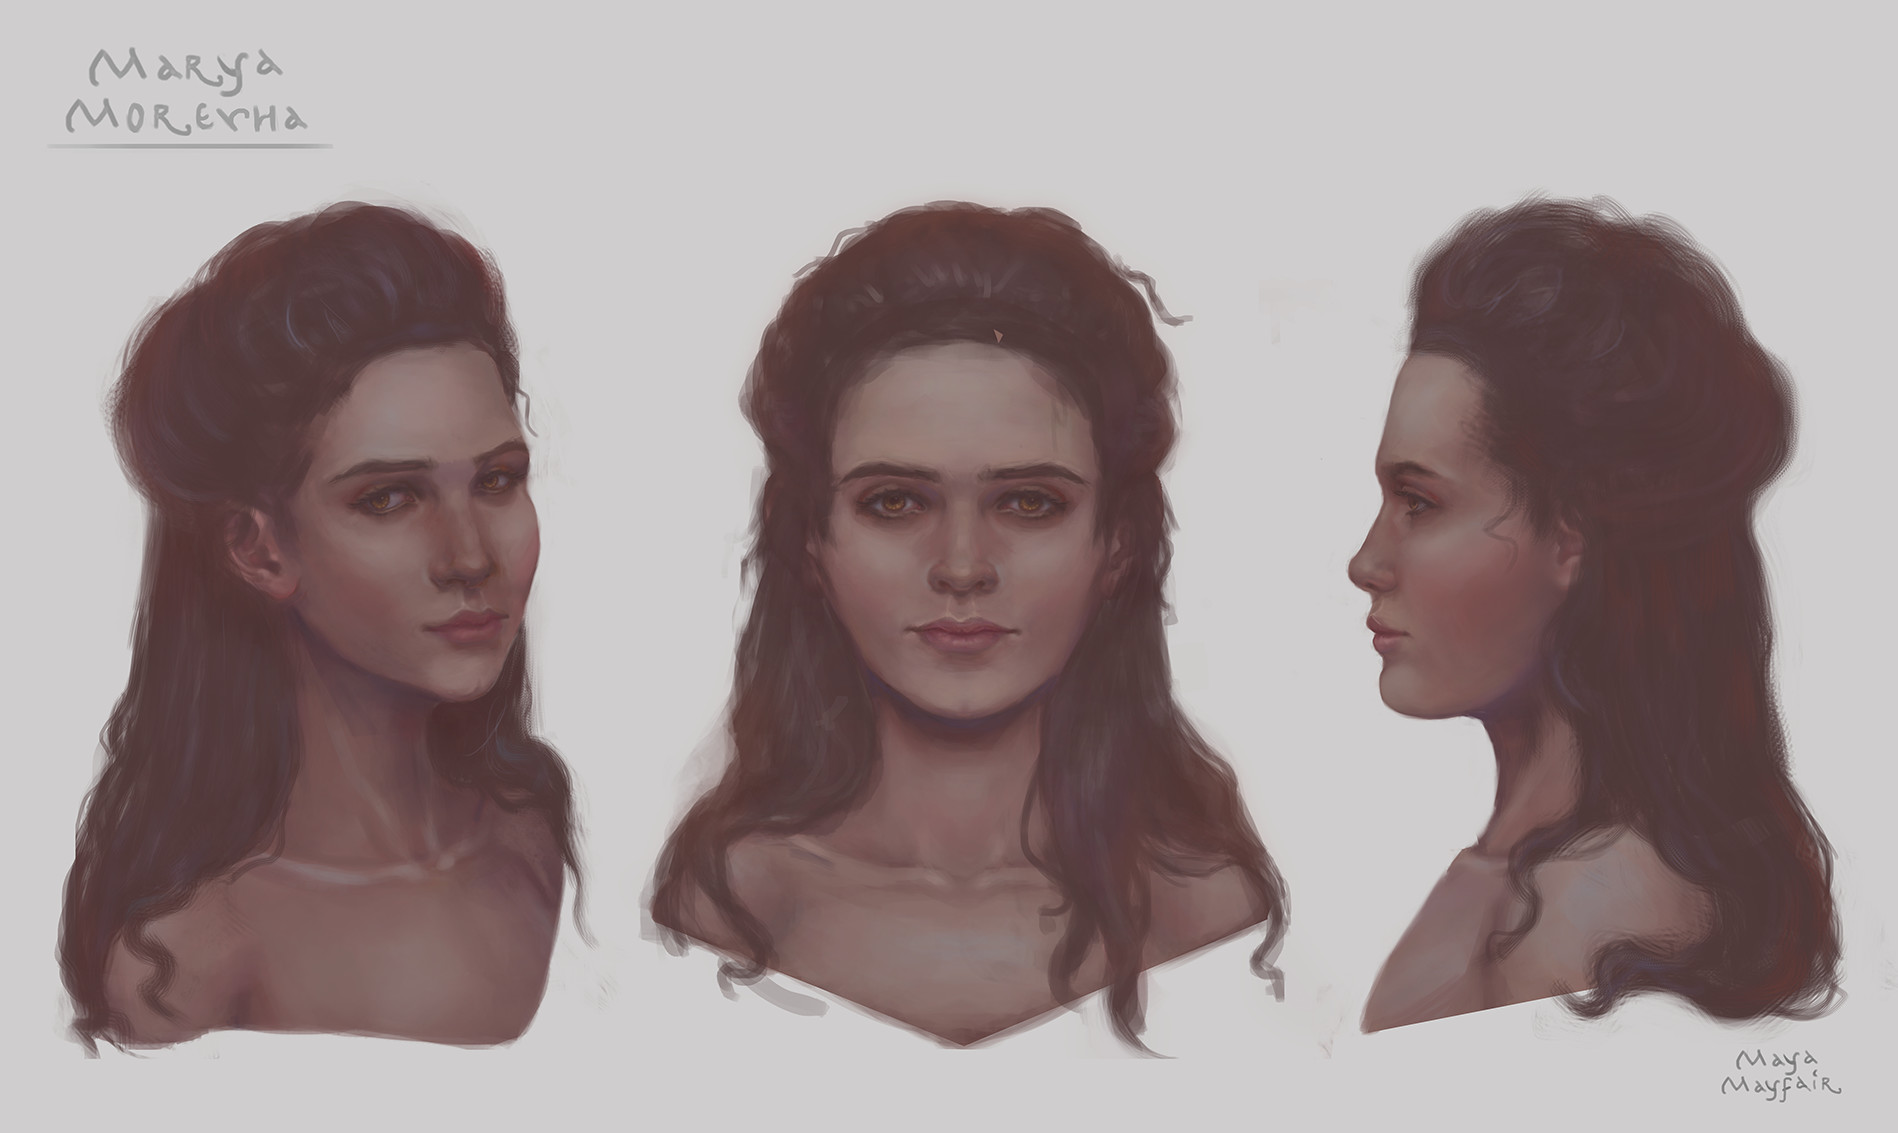 Maya grishanowitch marya faces taotb